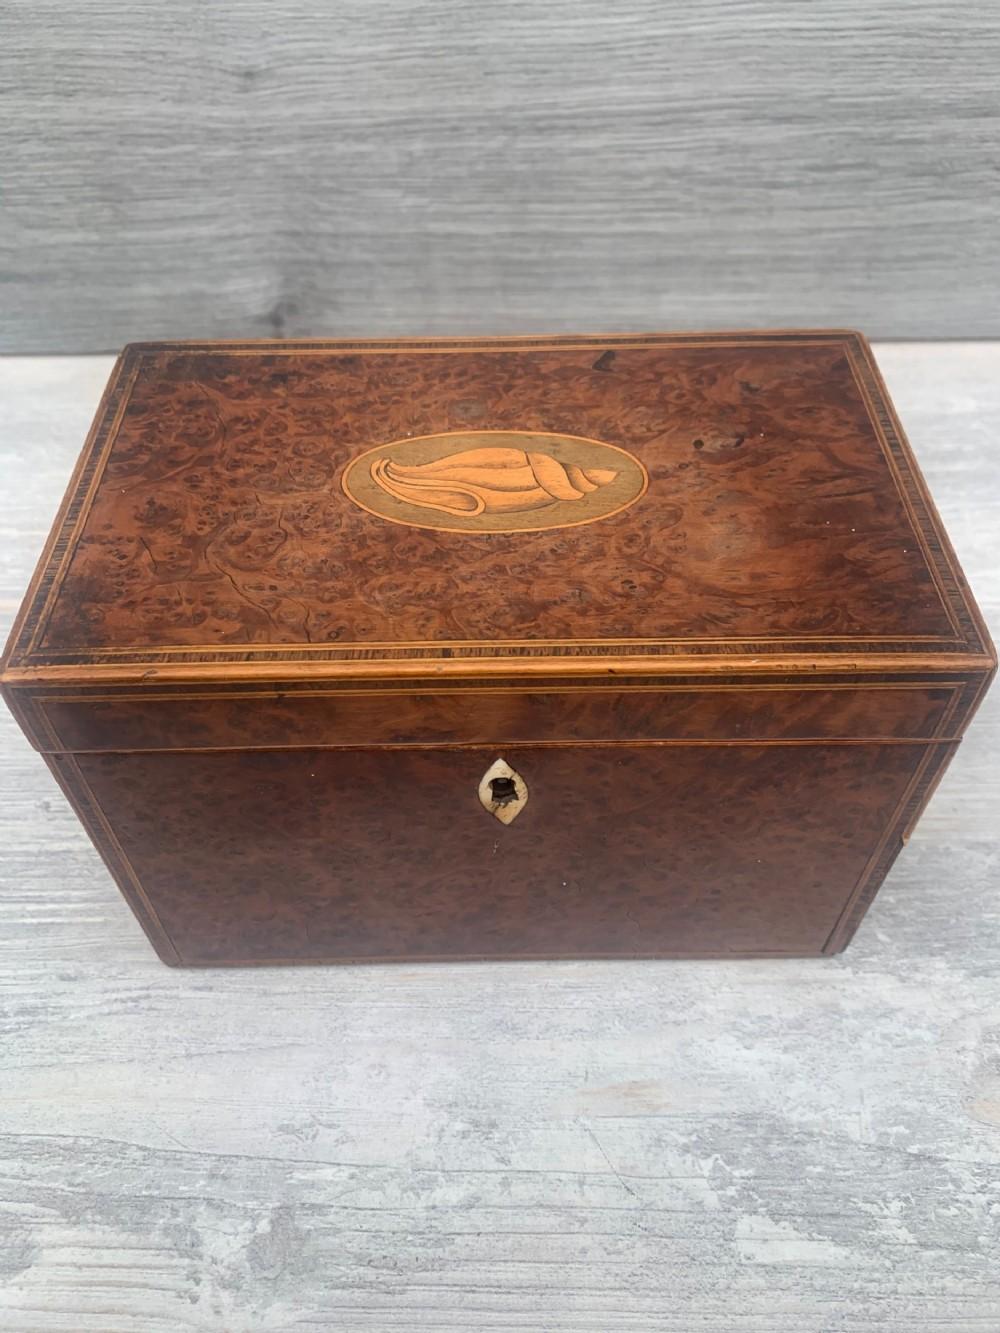 super all original georgian tea caddy maple wood with inlays